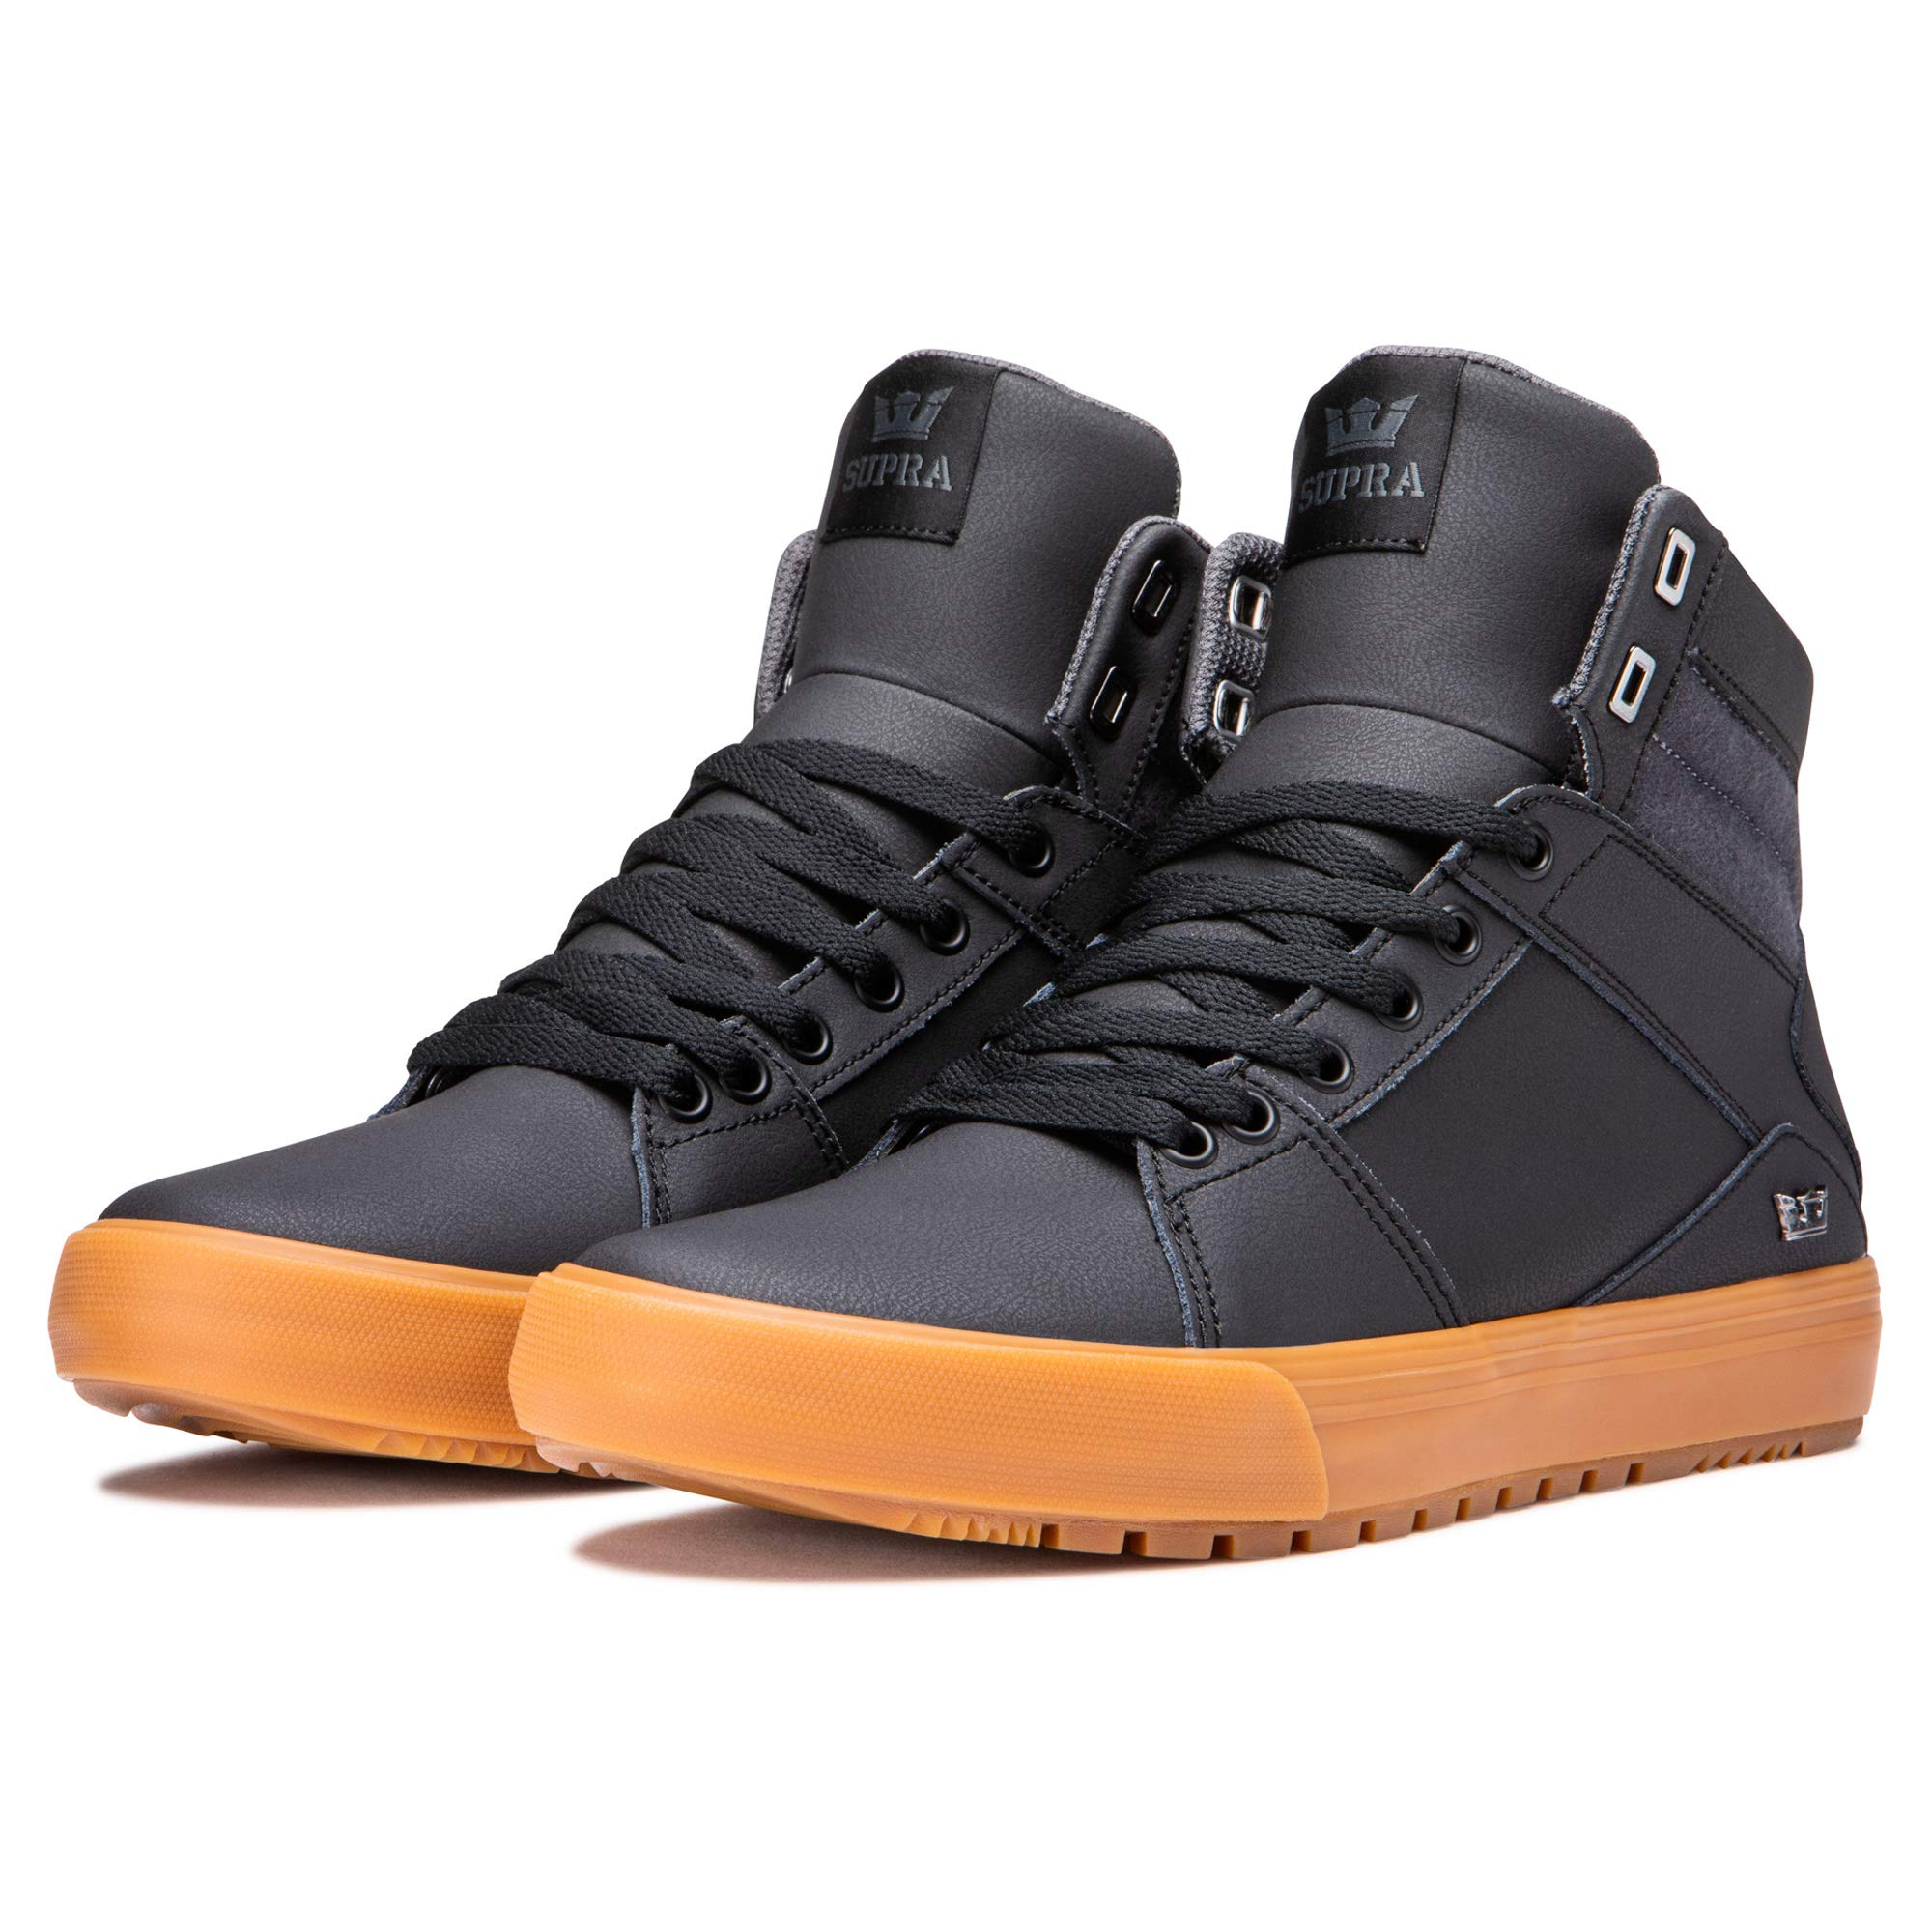 Supra Footwear - Aluminum Cold Weather High Top Skate Shoes, Black, 11.5 M US Women/10 M US Men by Supra